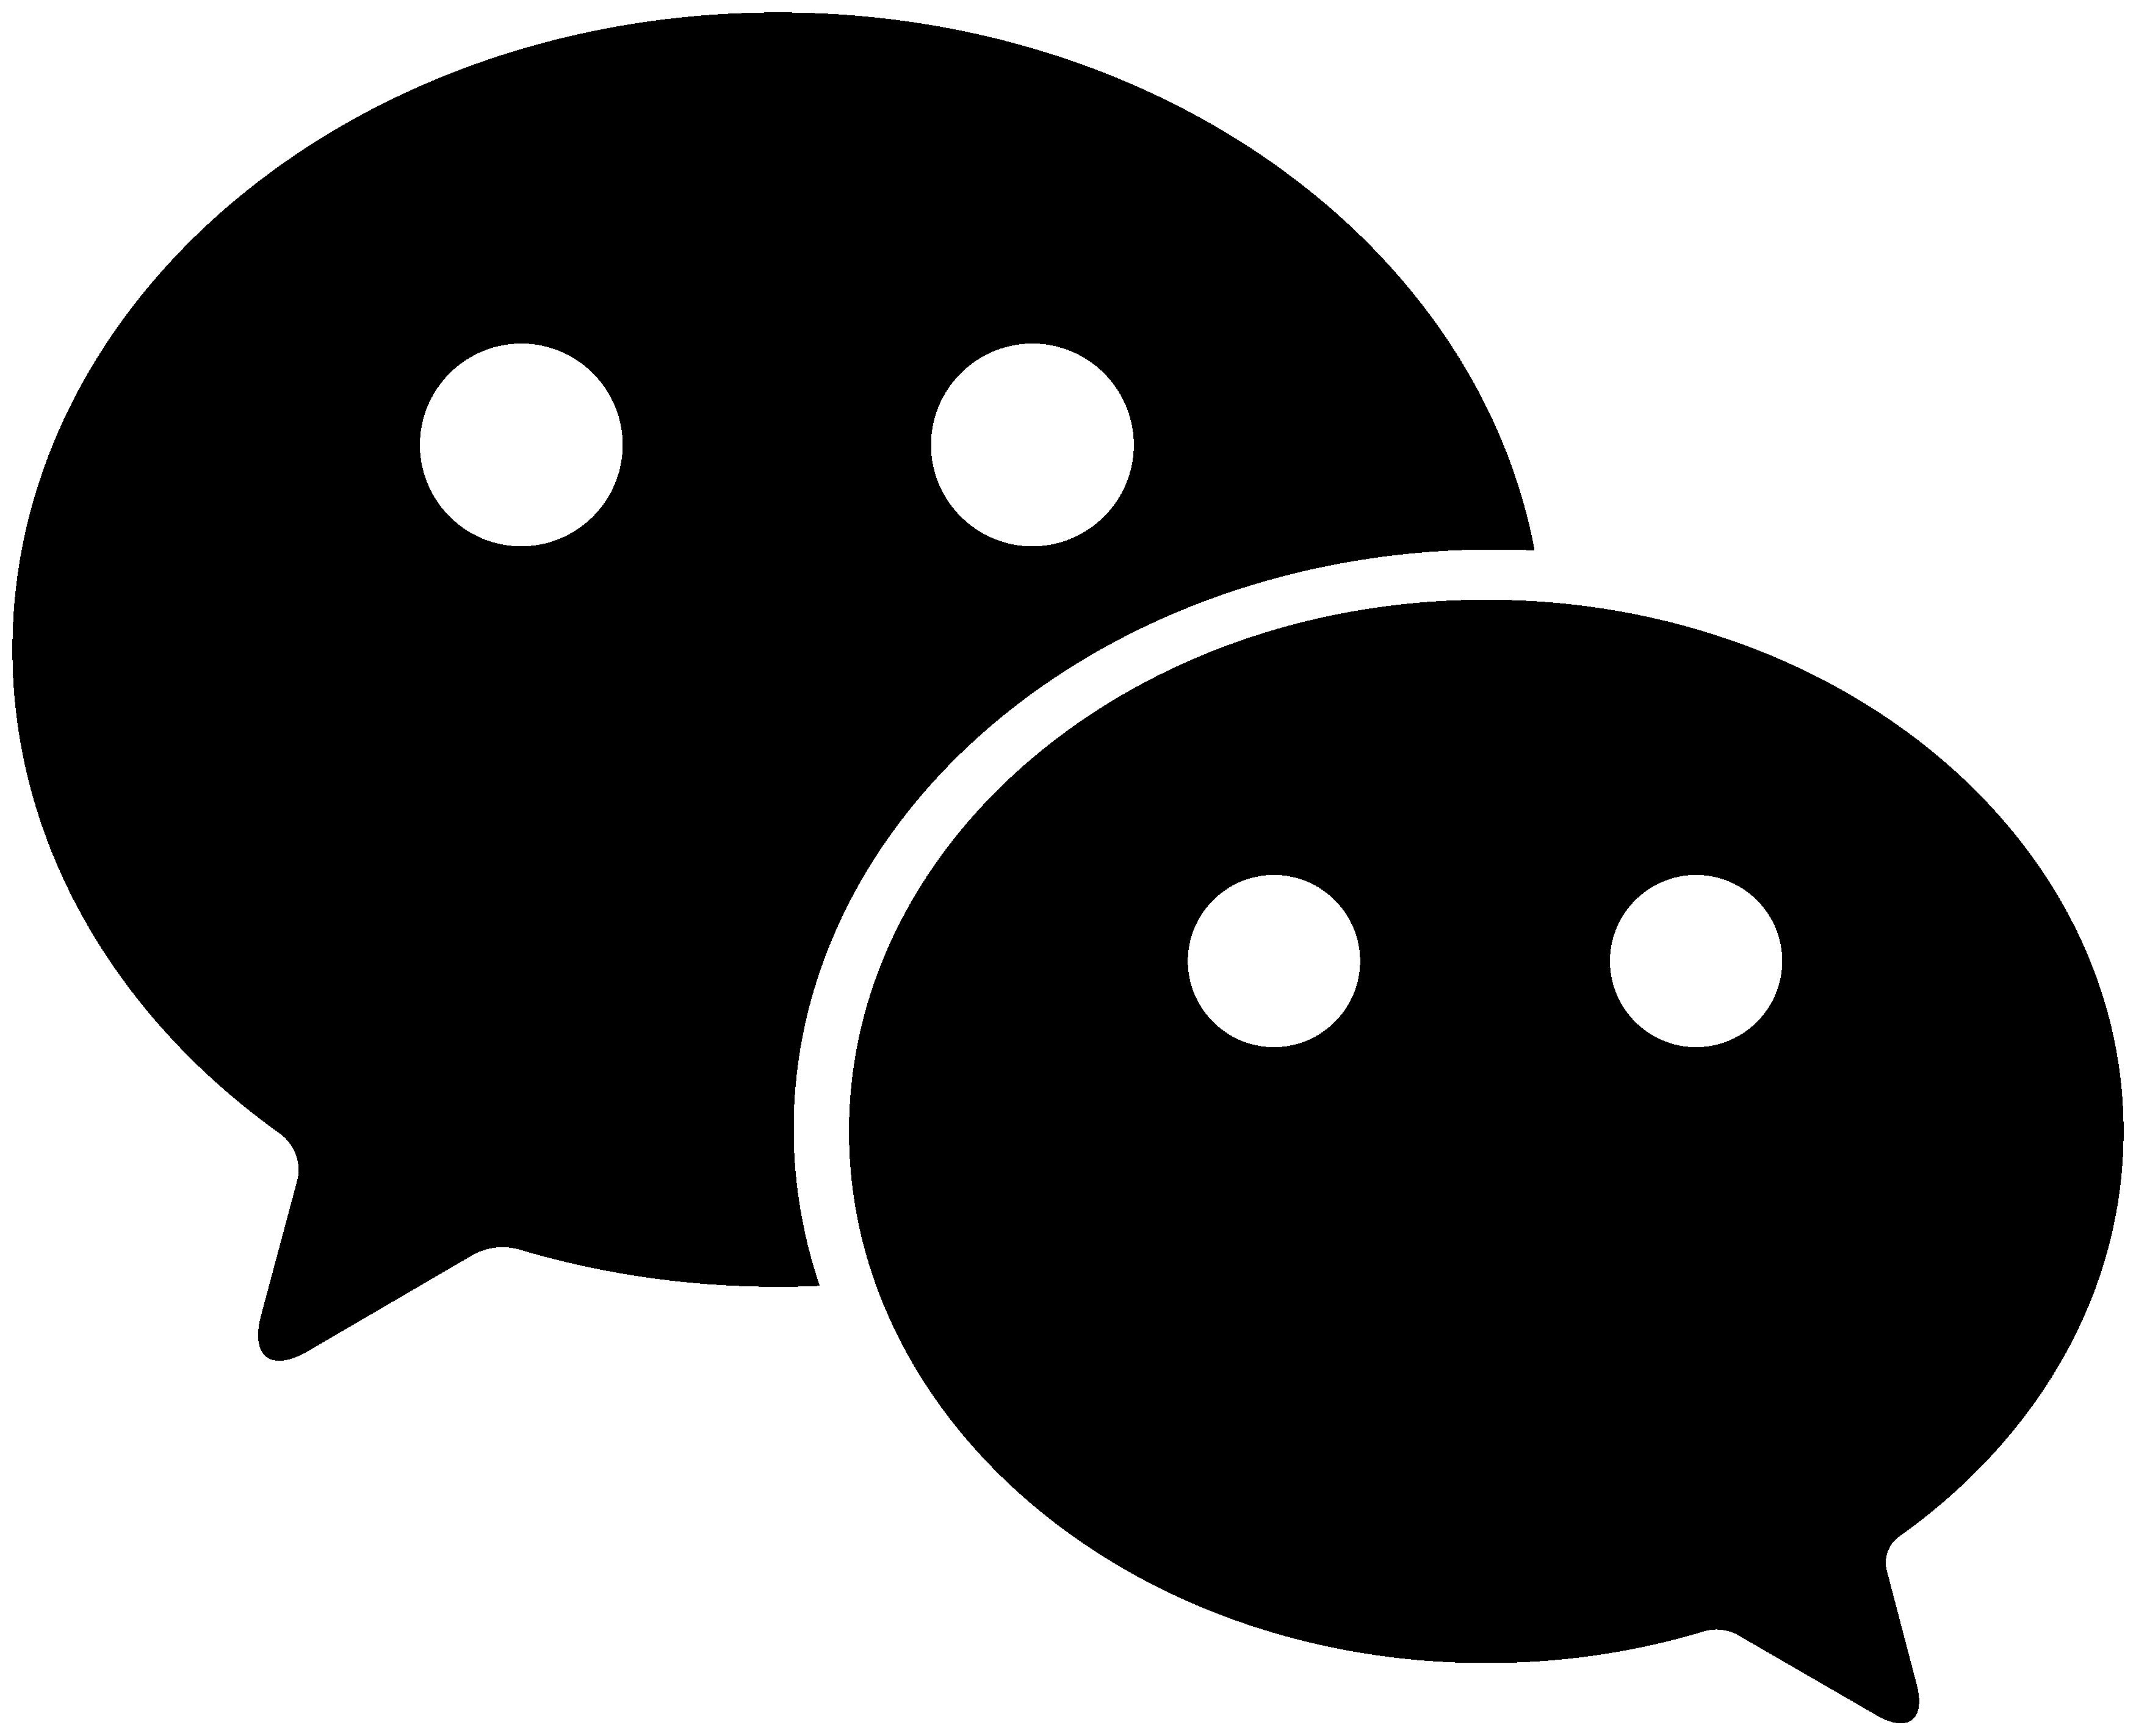 Wechat-logo Wechat_logo - Wechat Logo PNG